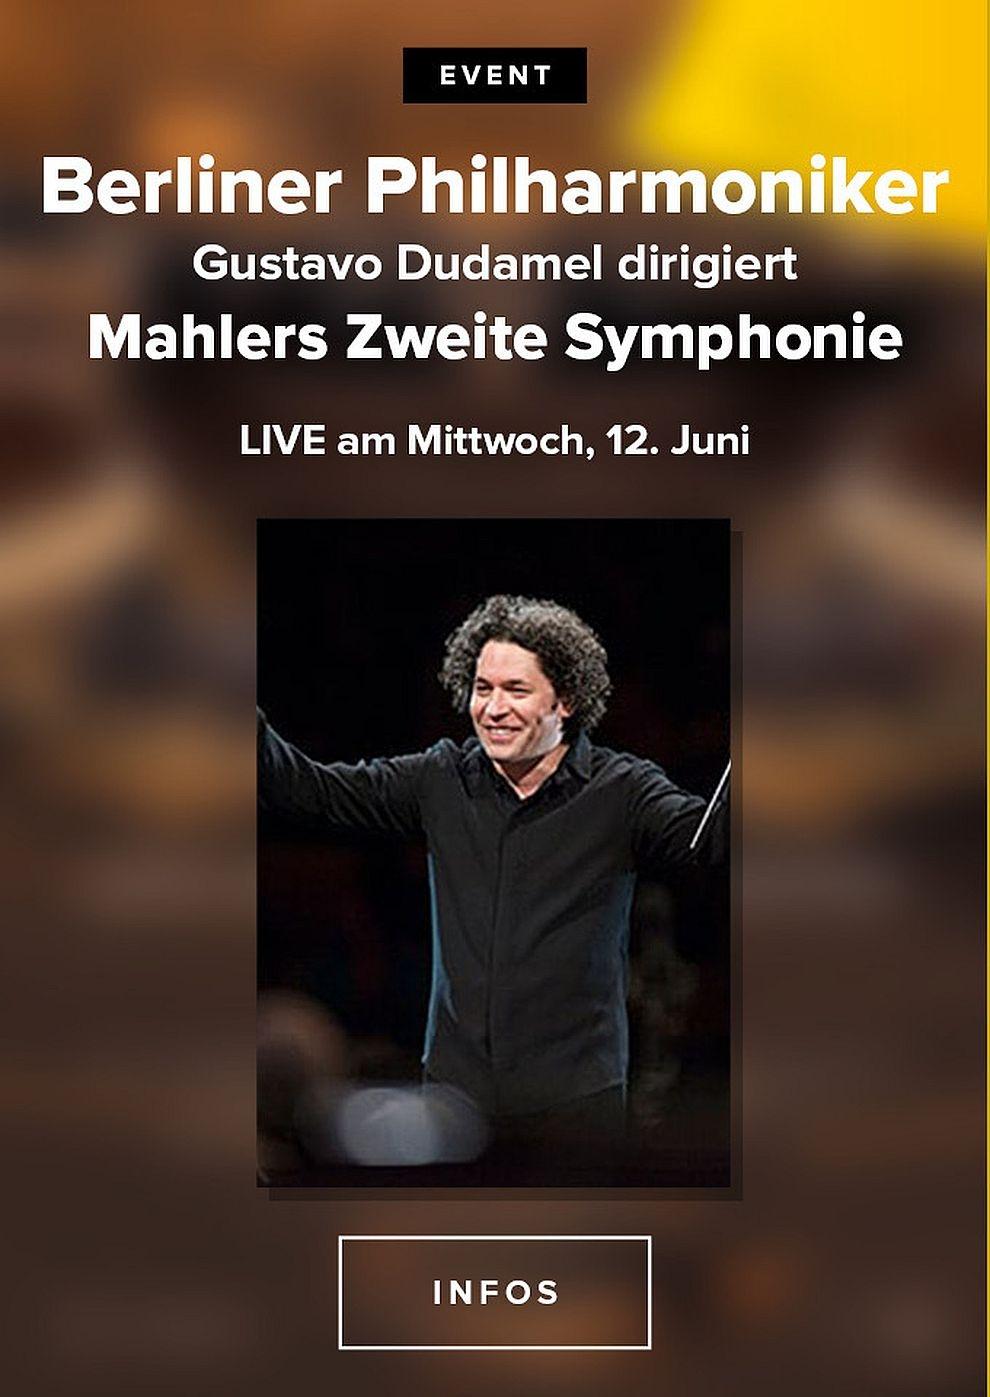 Berliner Philharmoniker 2019/20: Gustavo Dudamel dirigiert Mahlers Zweite Symphonie (Poster)